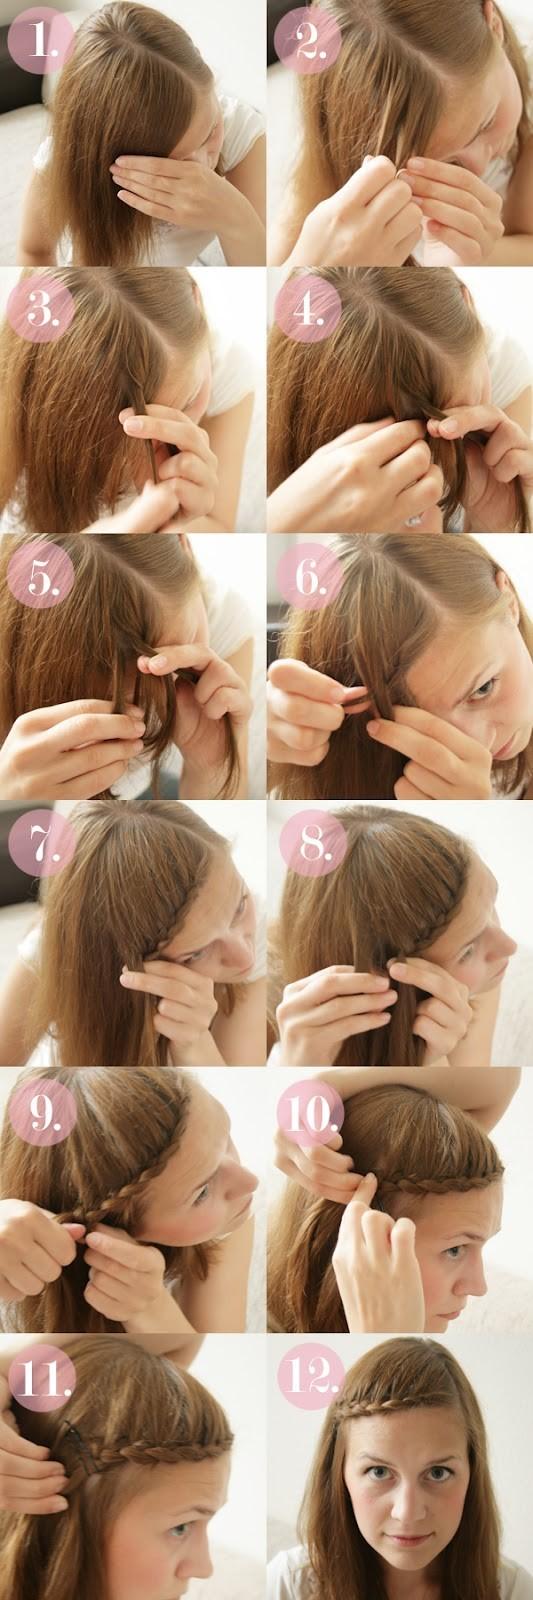 Pleasant 15 Braided Bangs Tutorials Cute Easy Hairstyles Pretty Designs Short Hairstyles For Black Women Fulllsitofus